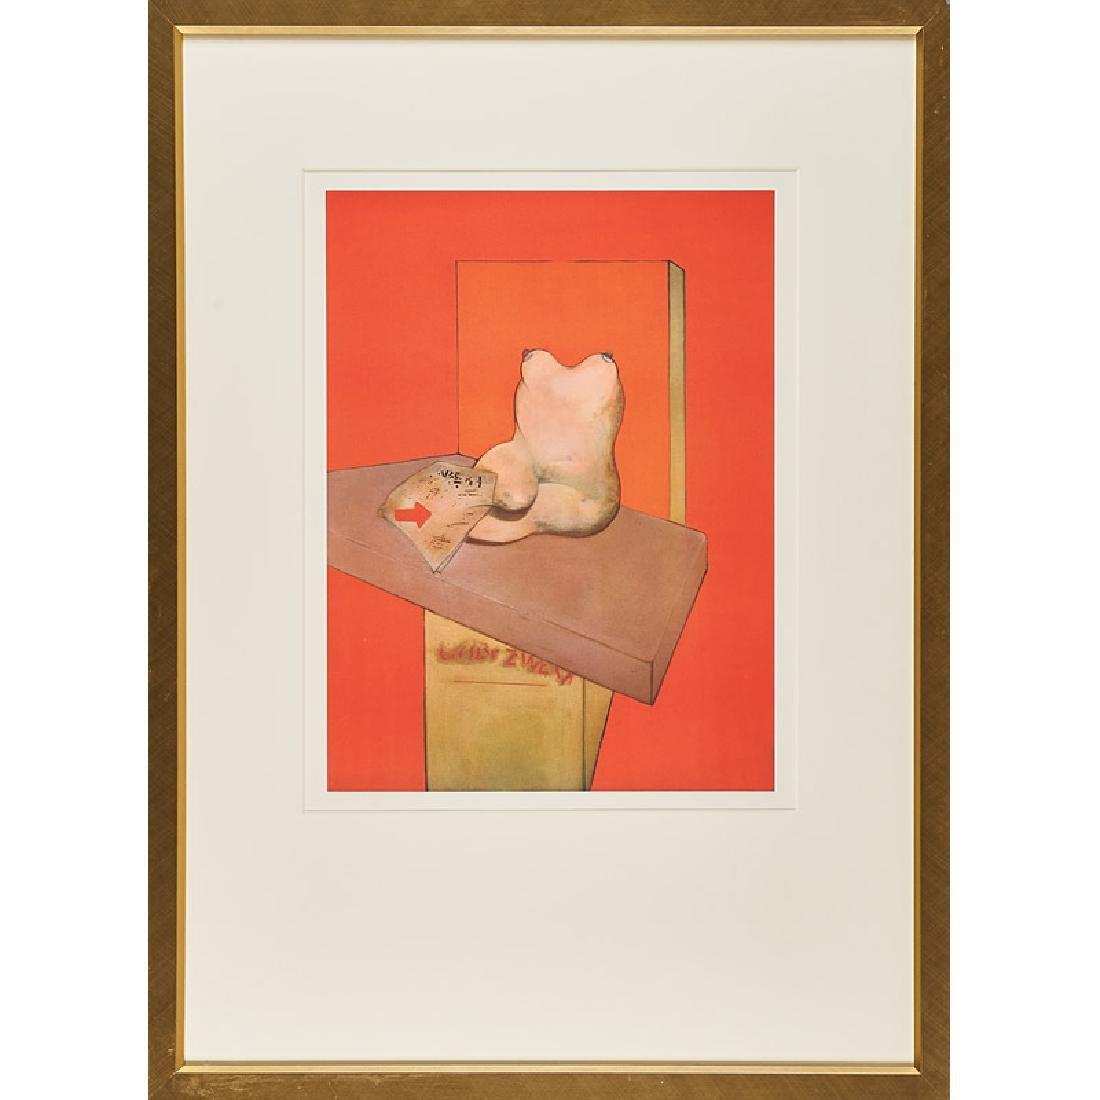 Francis Bacon (British, 1909-1992) - 2